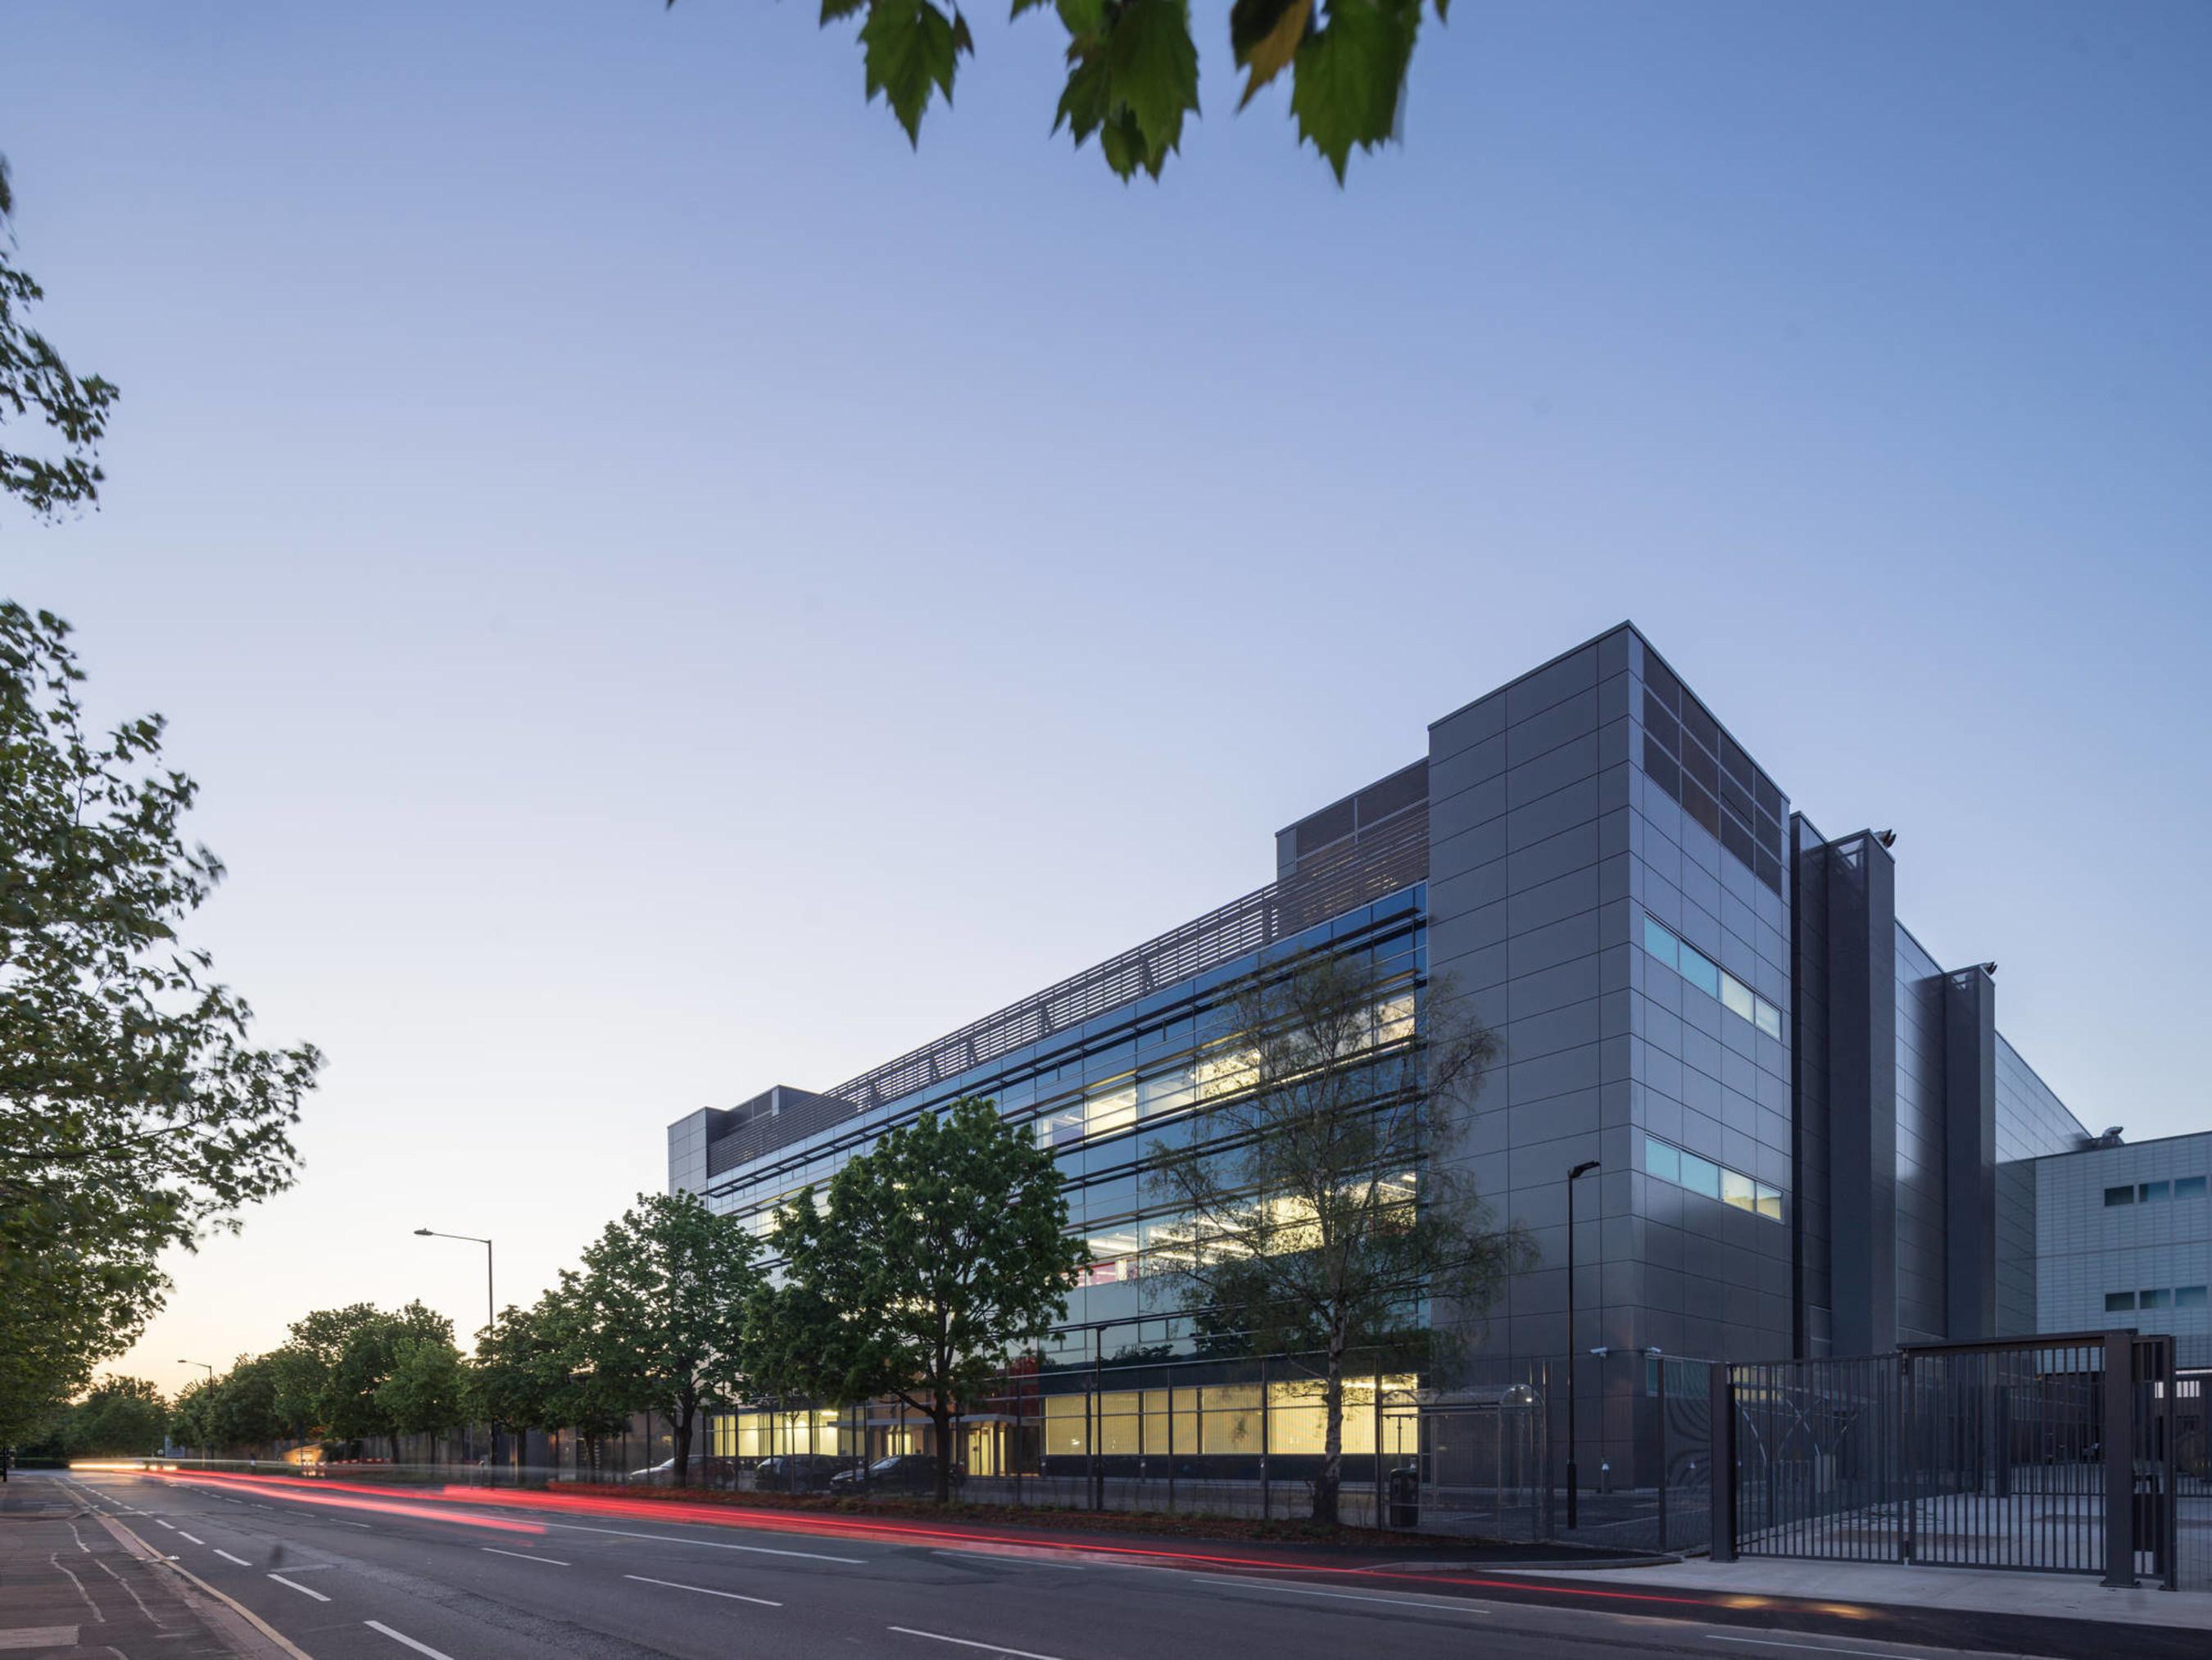 Equinix's LD6 London data center